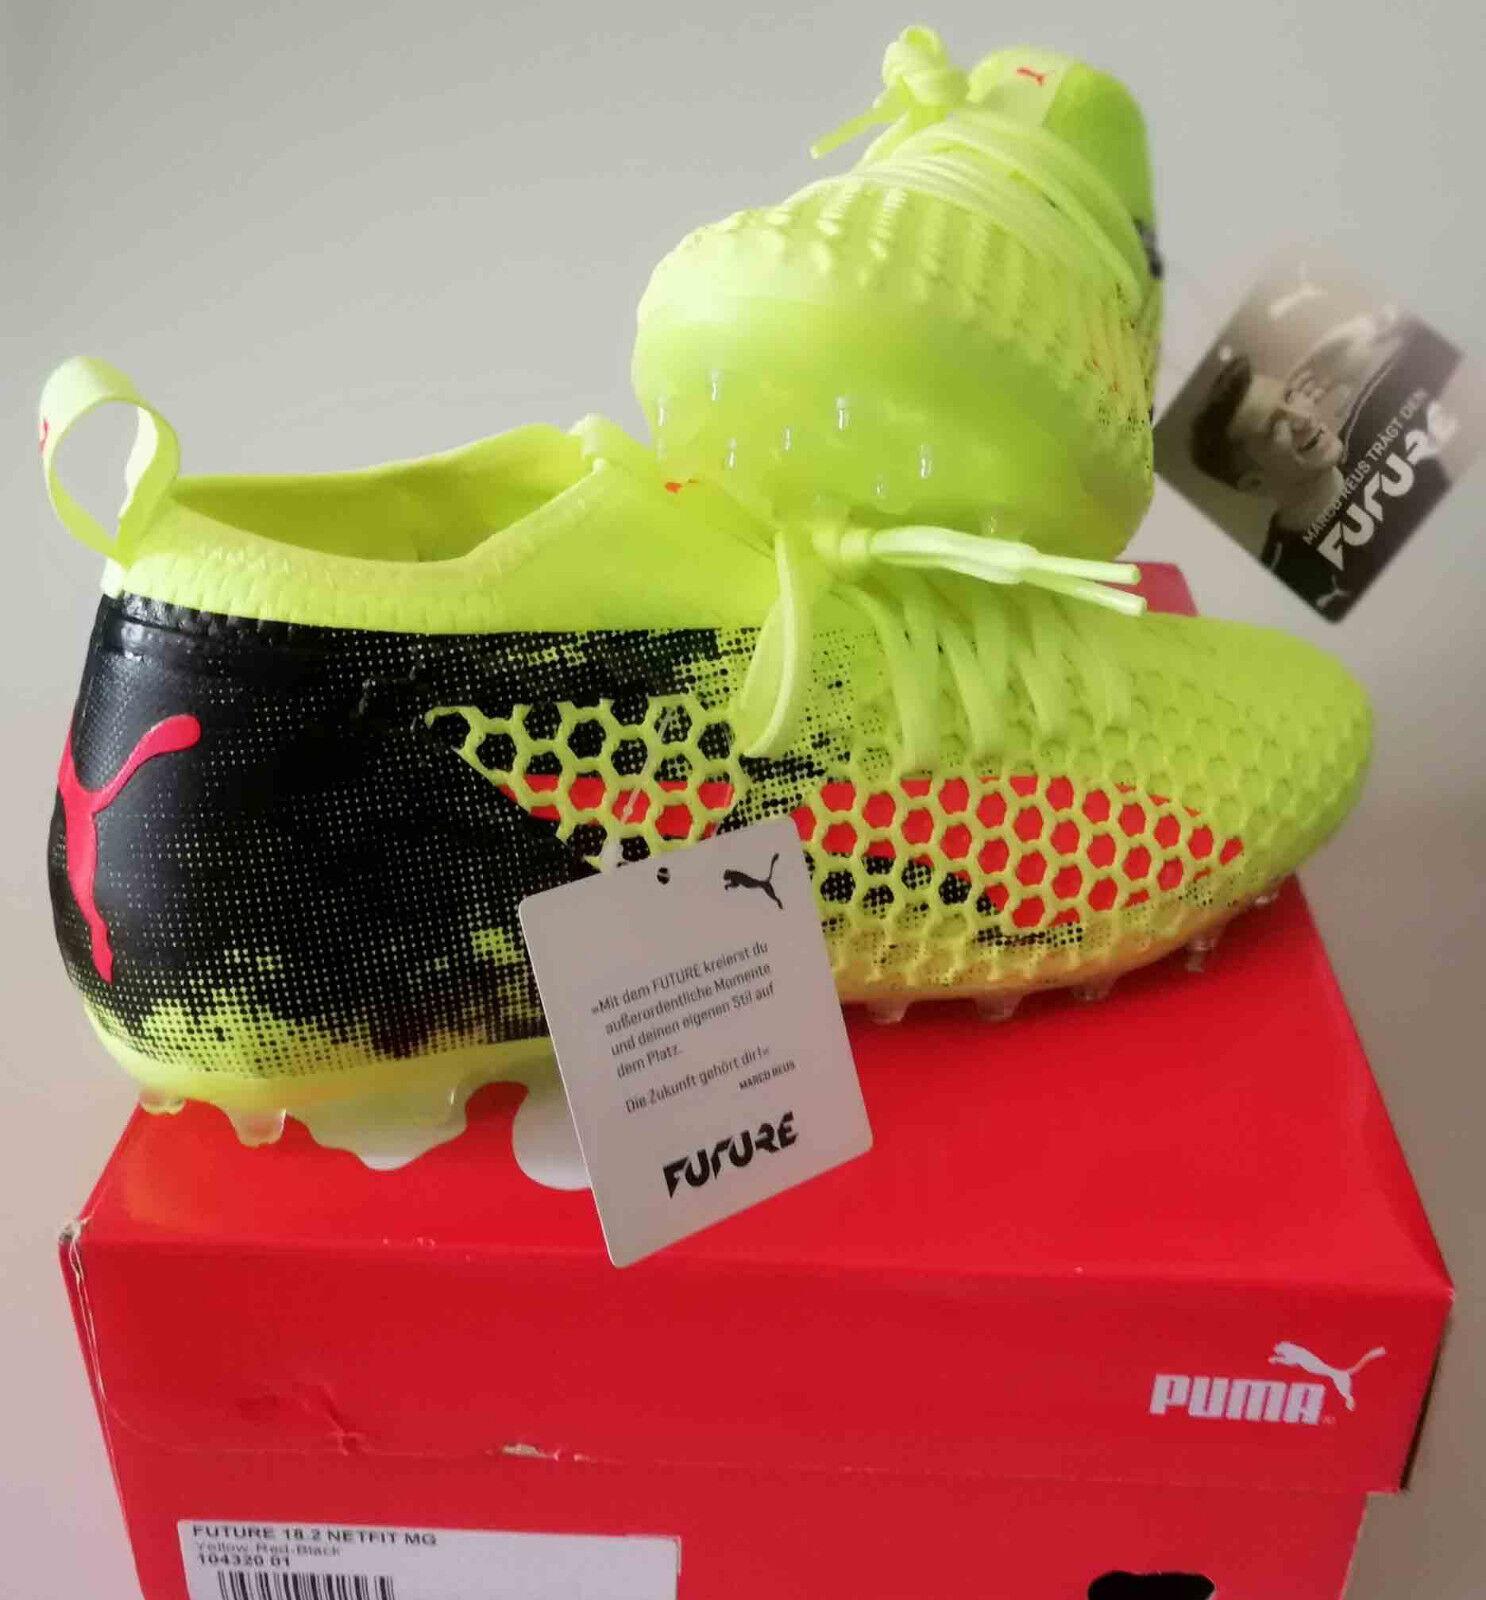 PUMA Scarpe Future 18.2 Mg Scarpe PUMA Calcio Tg 44,5 NUOVO df530f